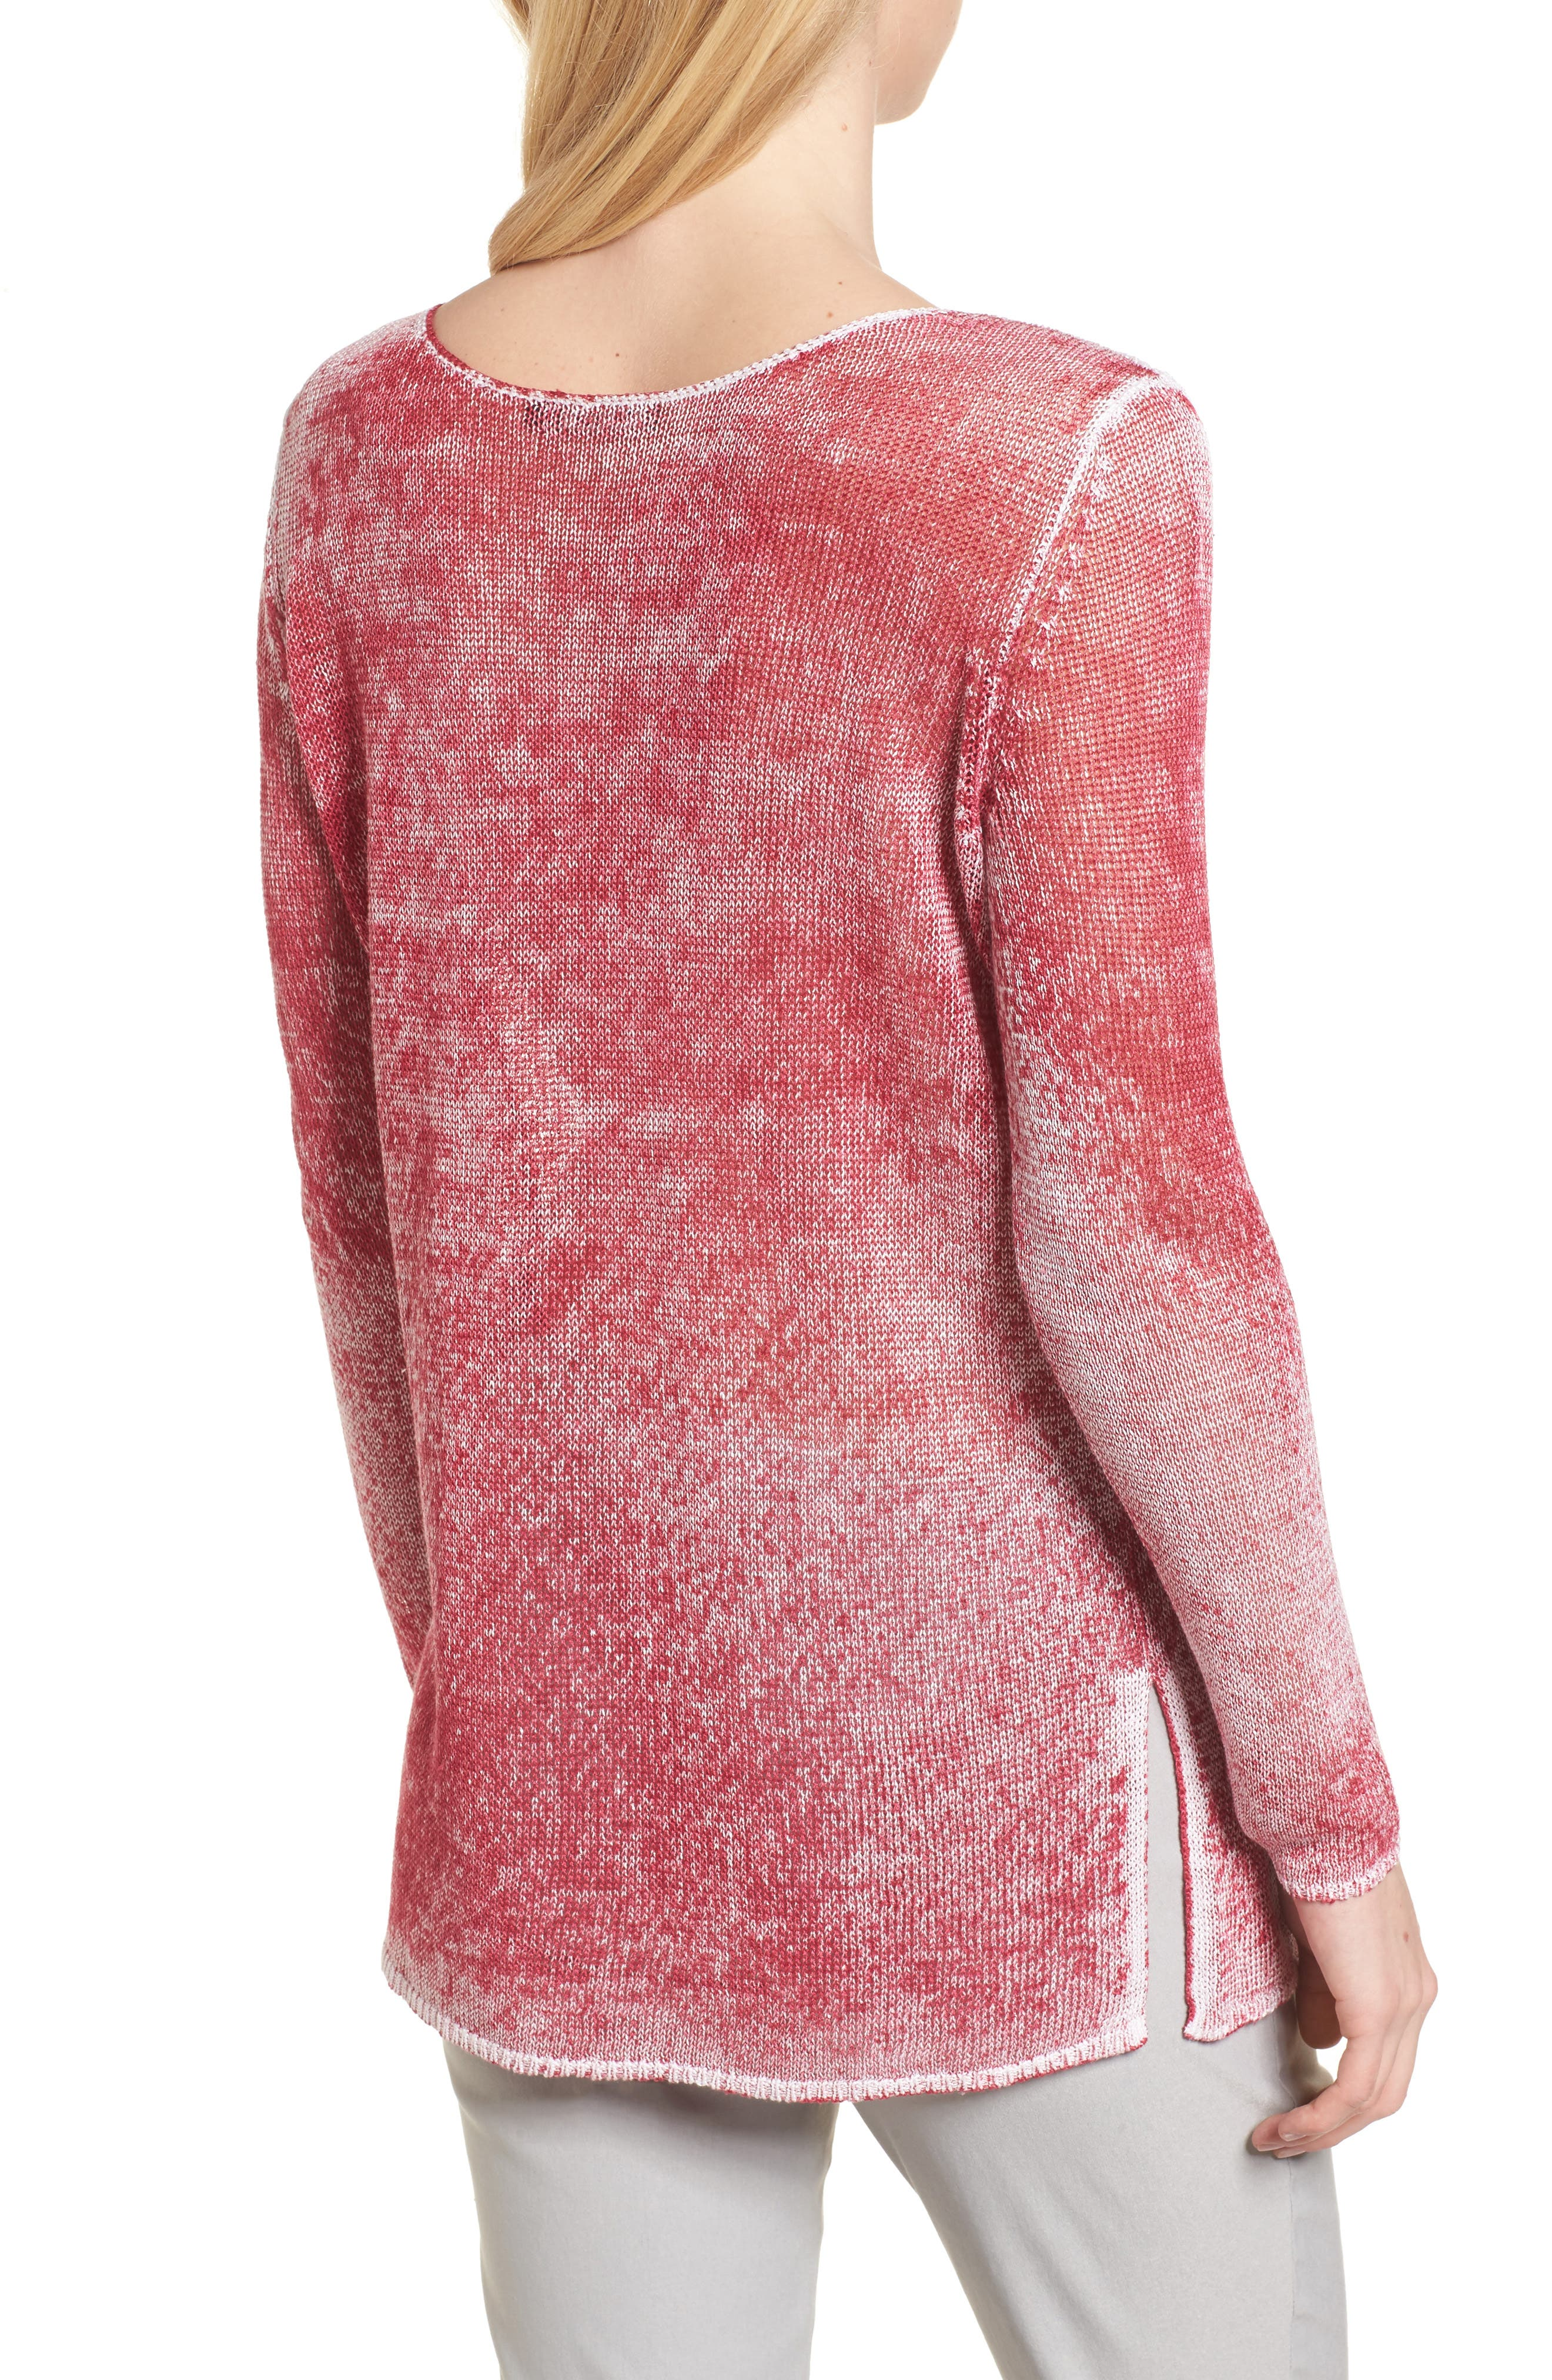 NIC + ZOE Poolside Linen Blend Sweater,                             Alternate thumbnail 7, color,